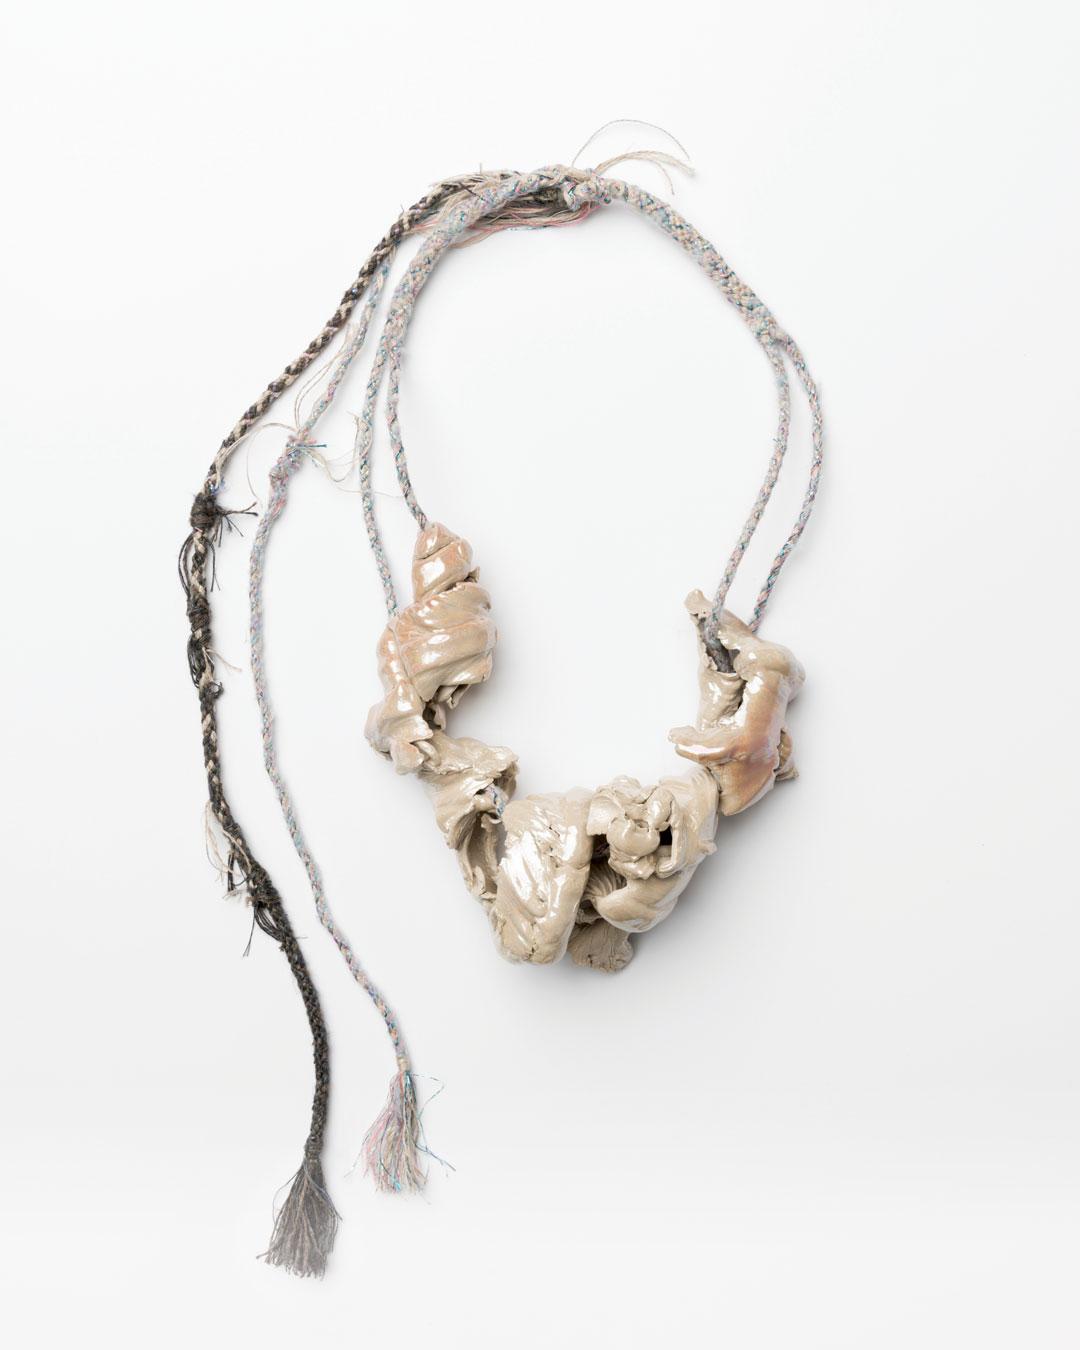 Ineke Heerkens, Accidental Curiosity, 2017, necklace; linen, cotton, lurex, wool, silk, ceramic, glaze, iris lustre, 360 x 175 x 70 mm, €2100